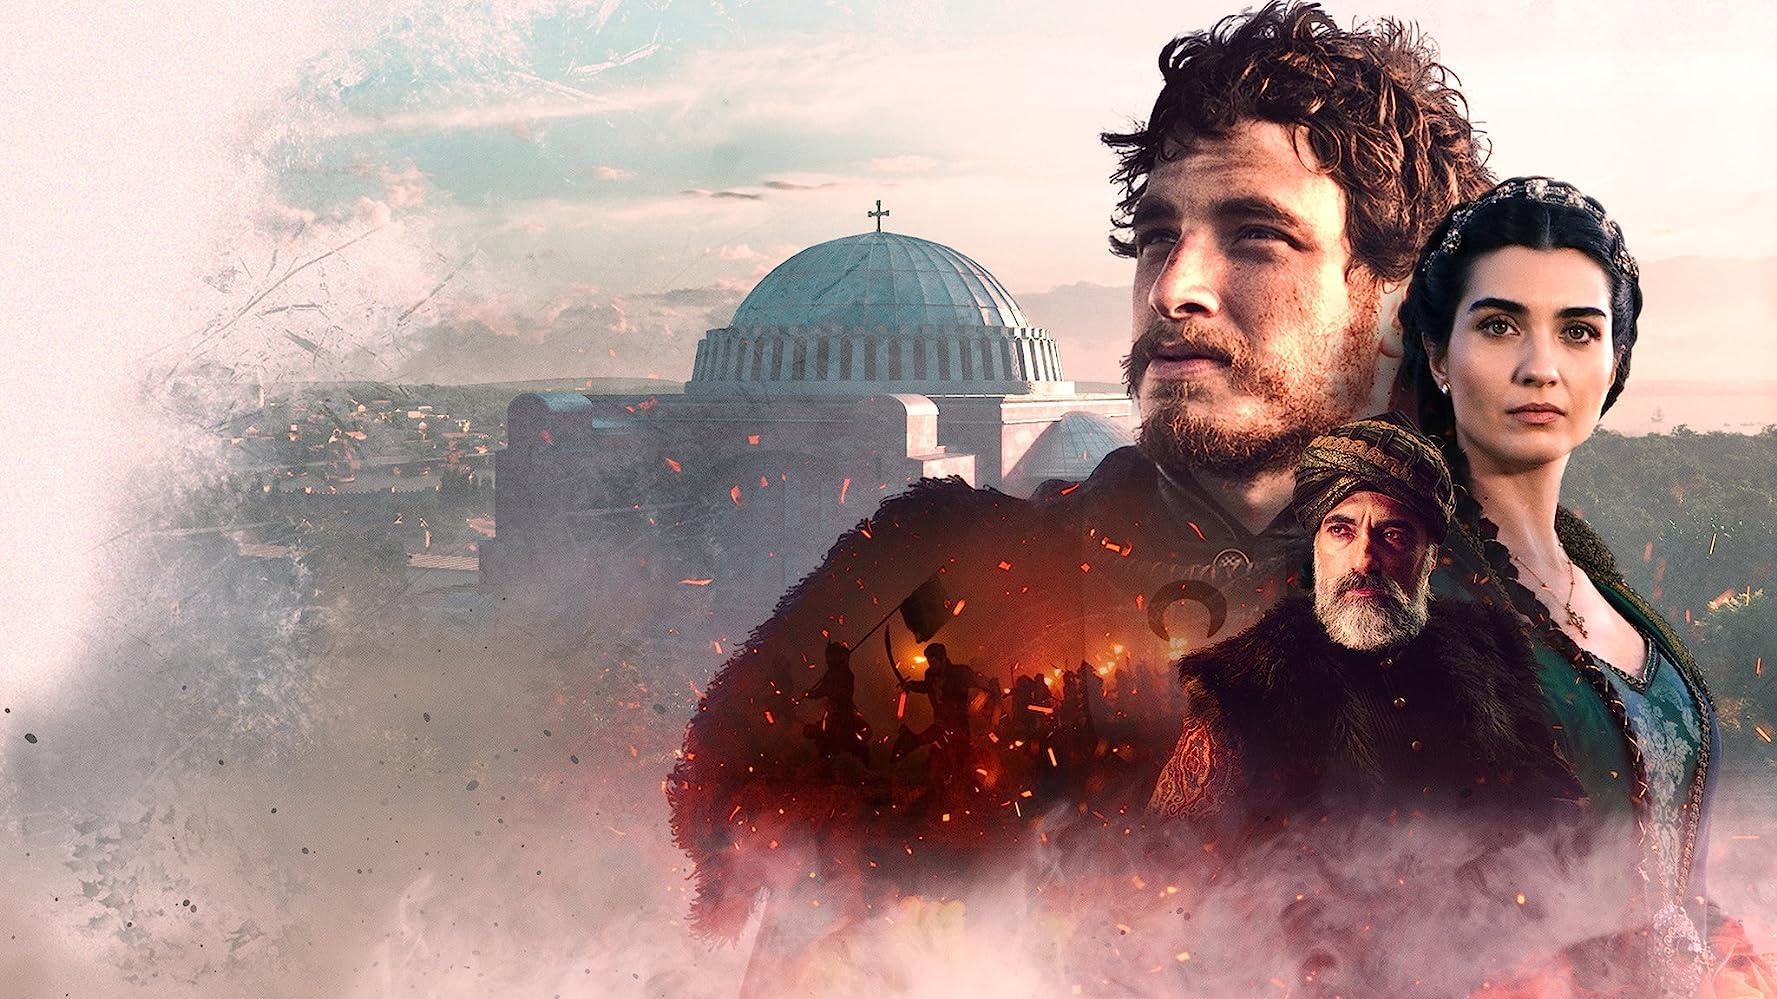 Tuba Büyüküstün, Selim Bayraktar, and Cem Yigit Uzümoglu in Rise of Empires: Ottoman (2020)